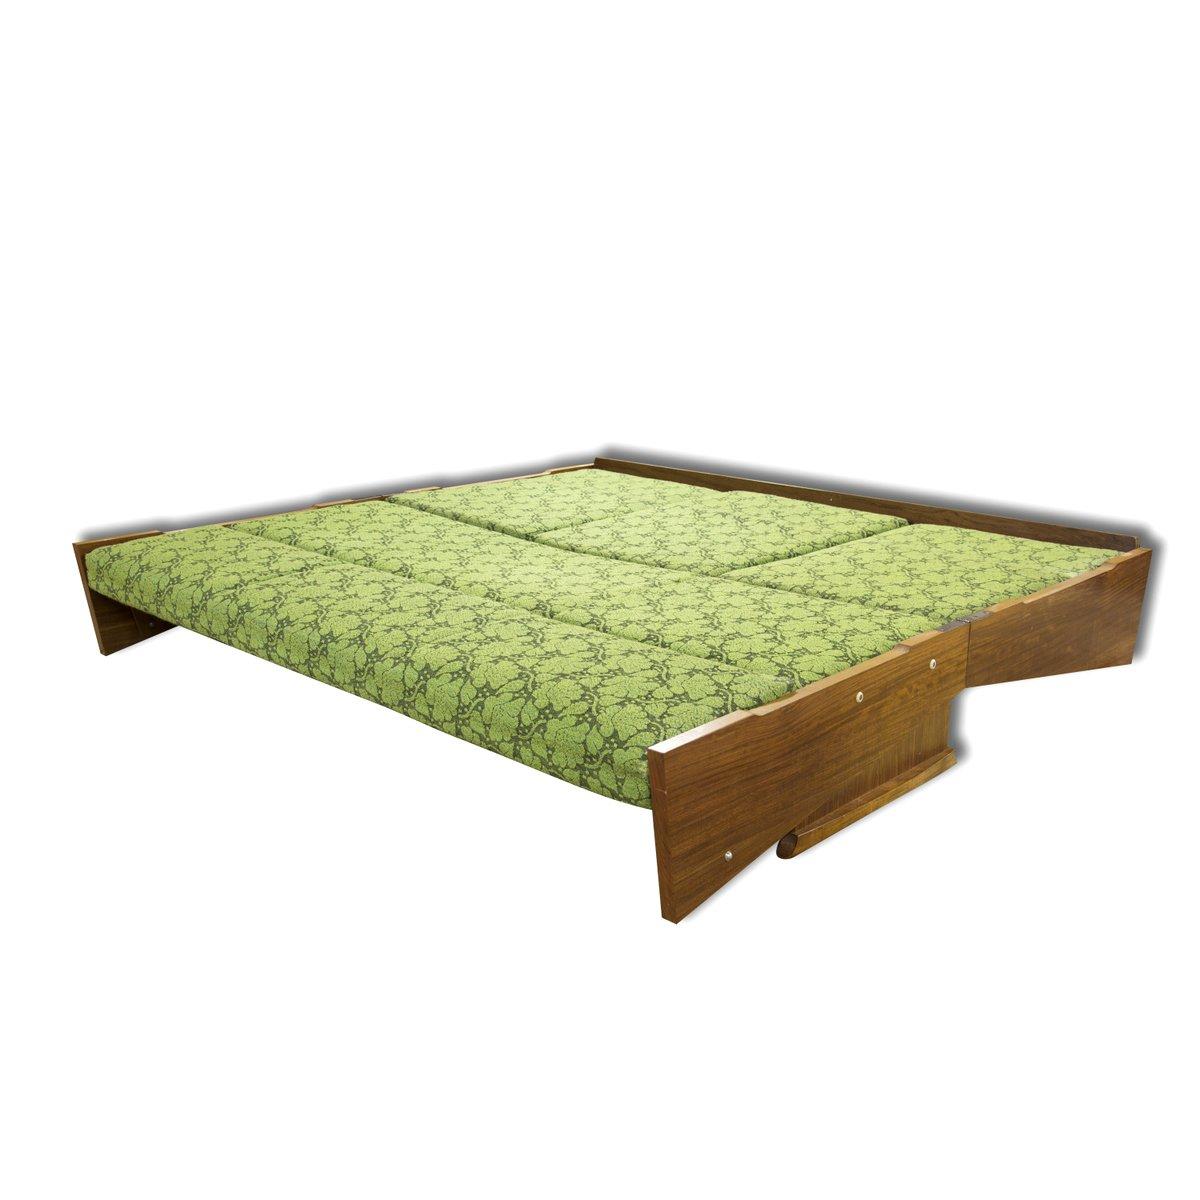 Buy Sofa Bed Ireland Www Jakubmroz Com